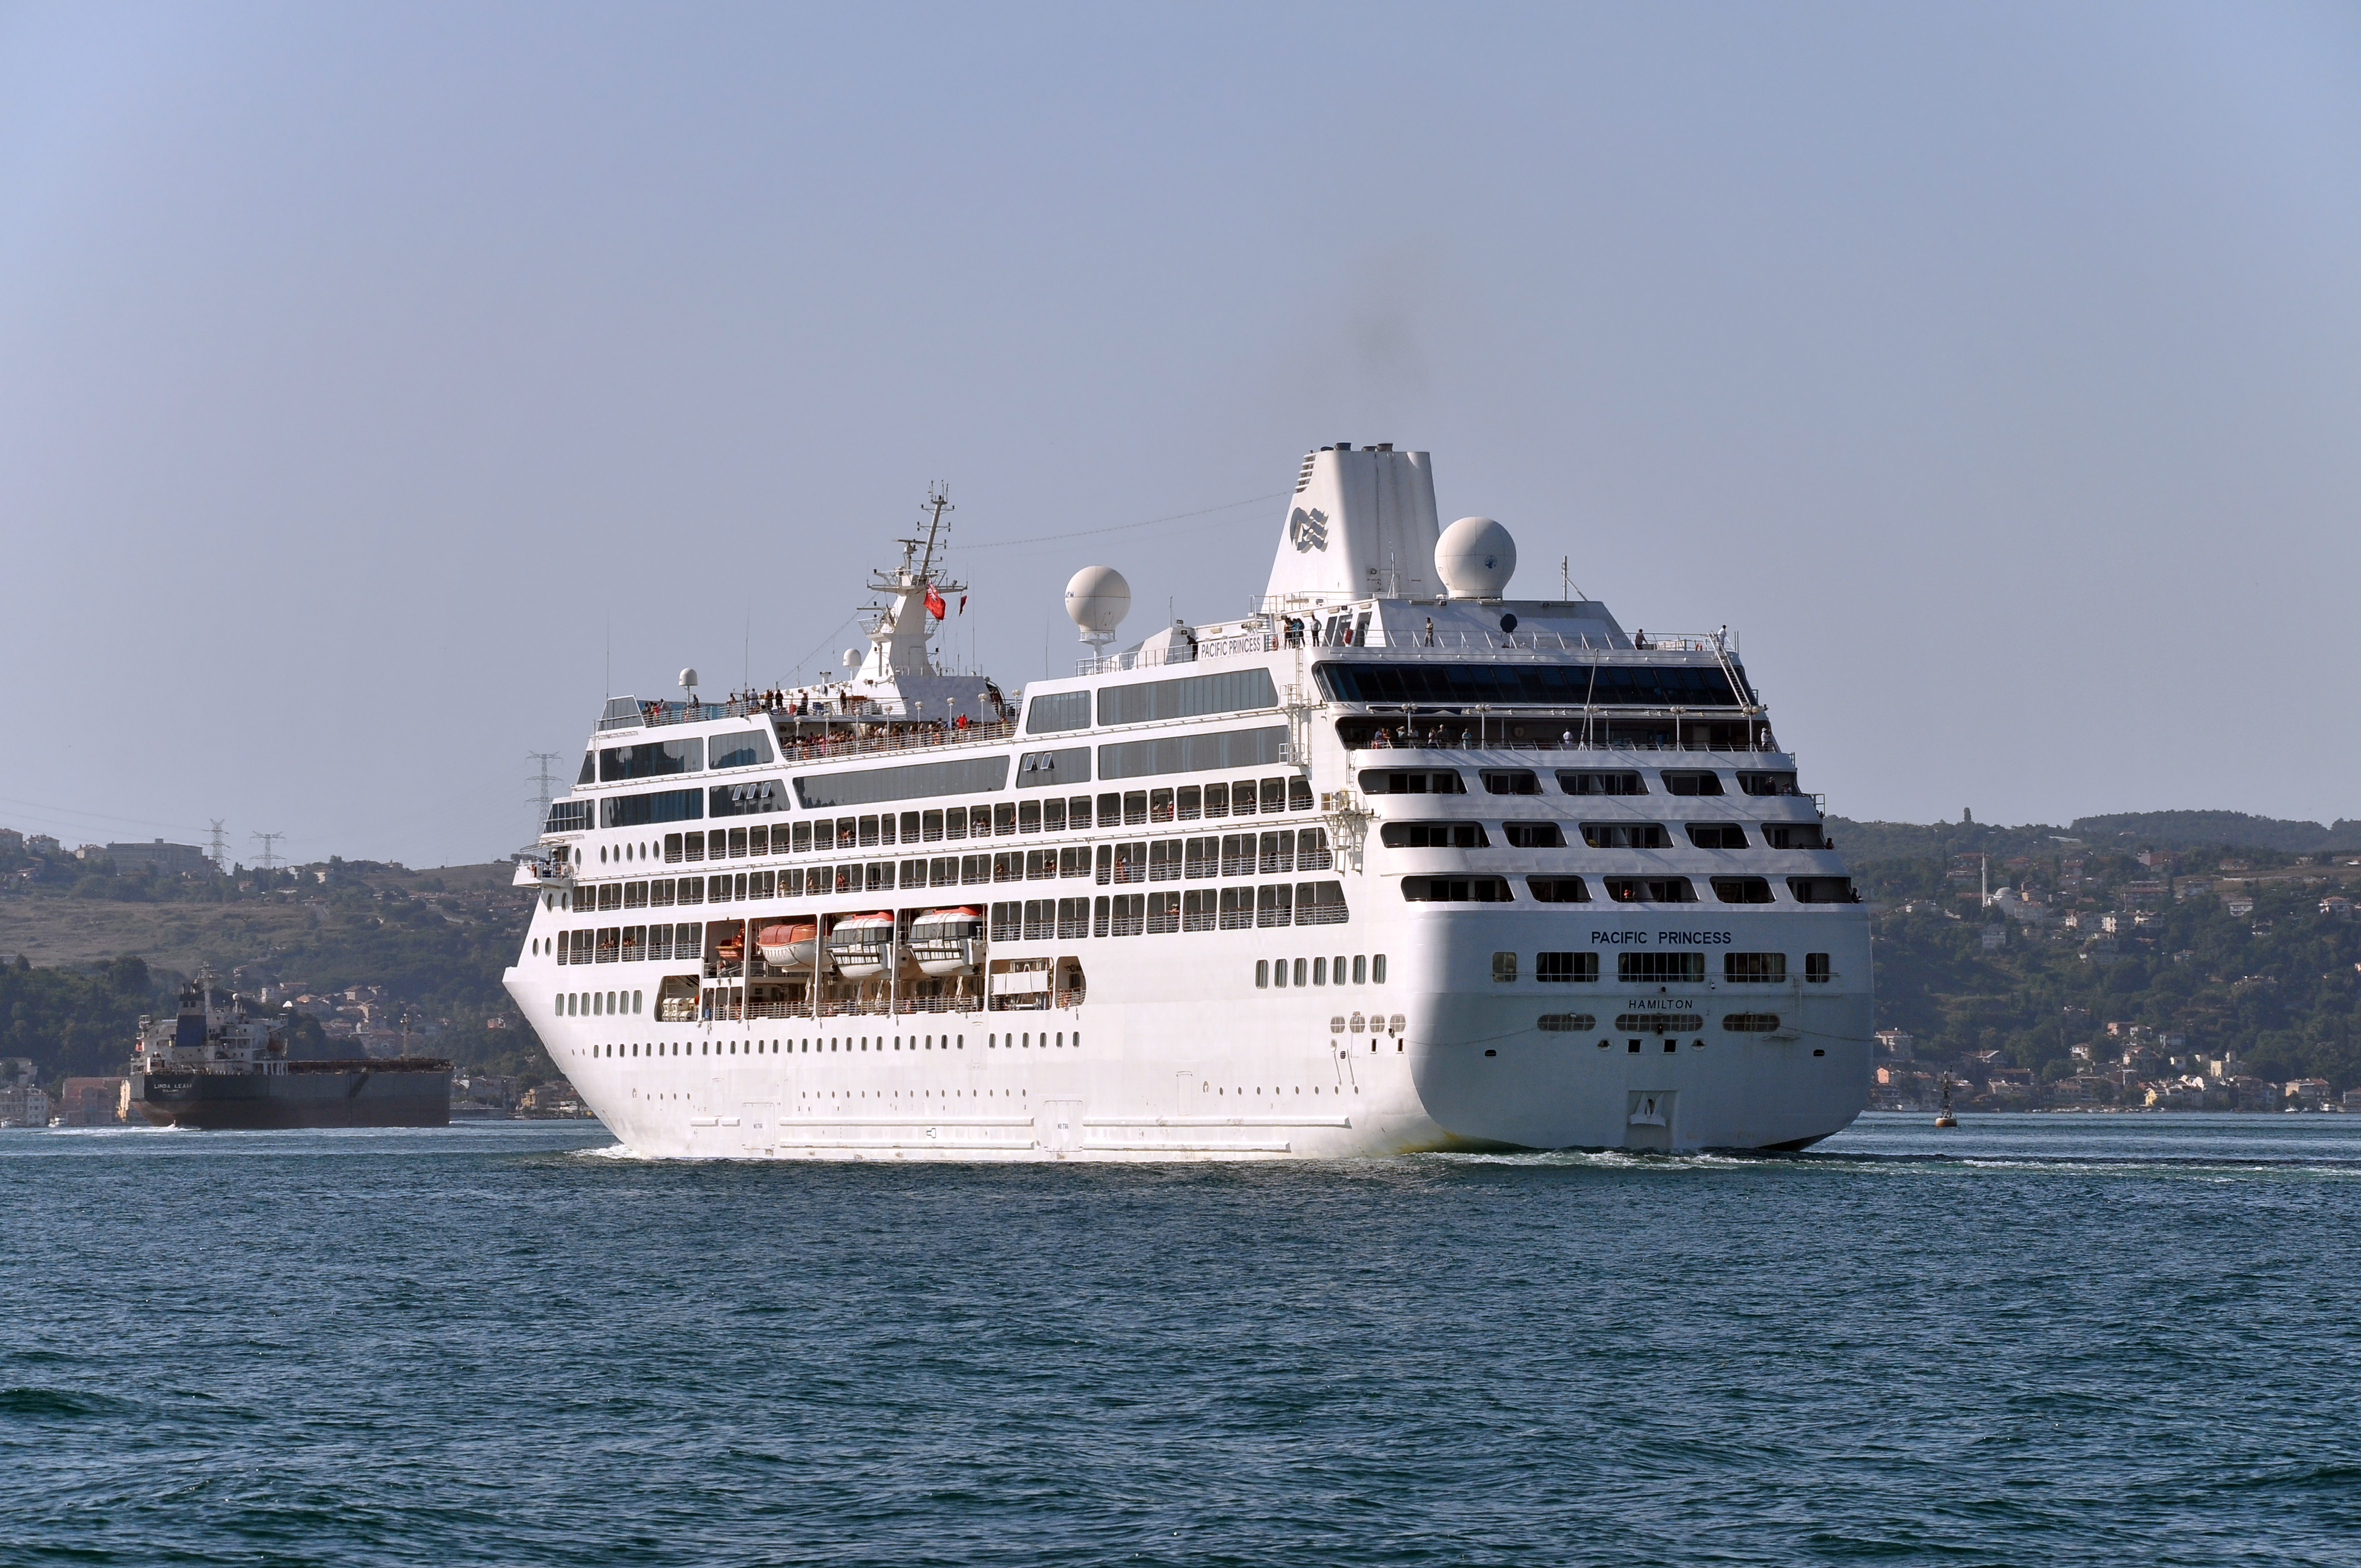 C A Turkey Istanbul File:Pacific Princess ...